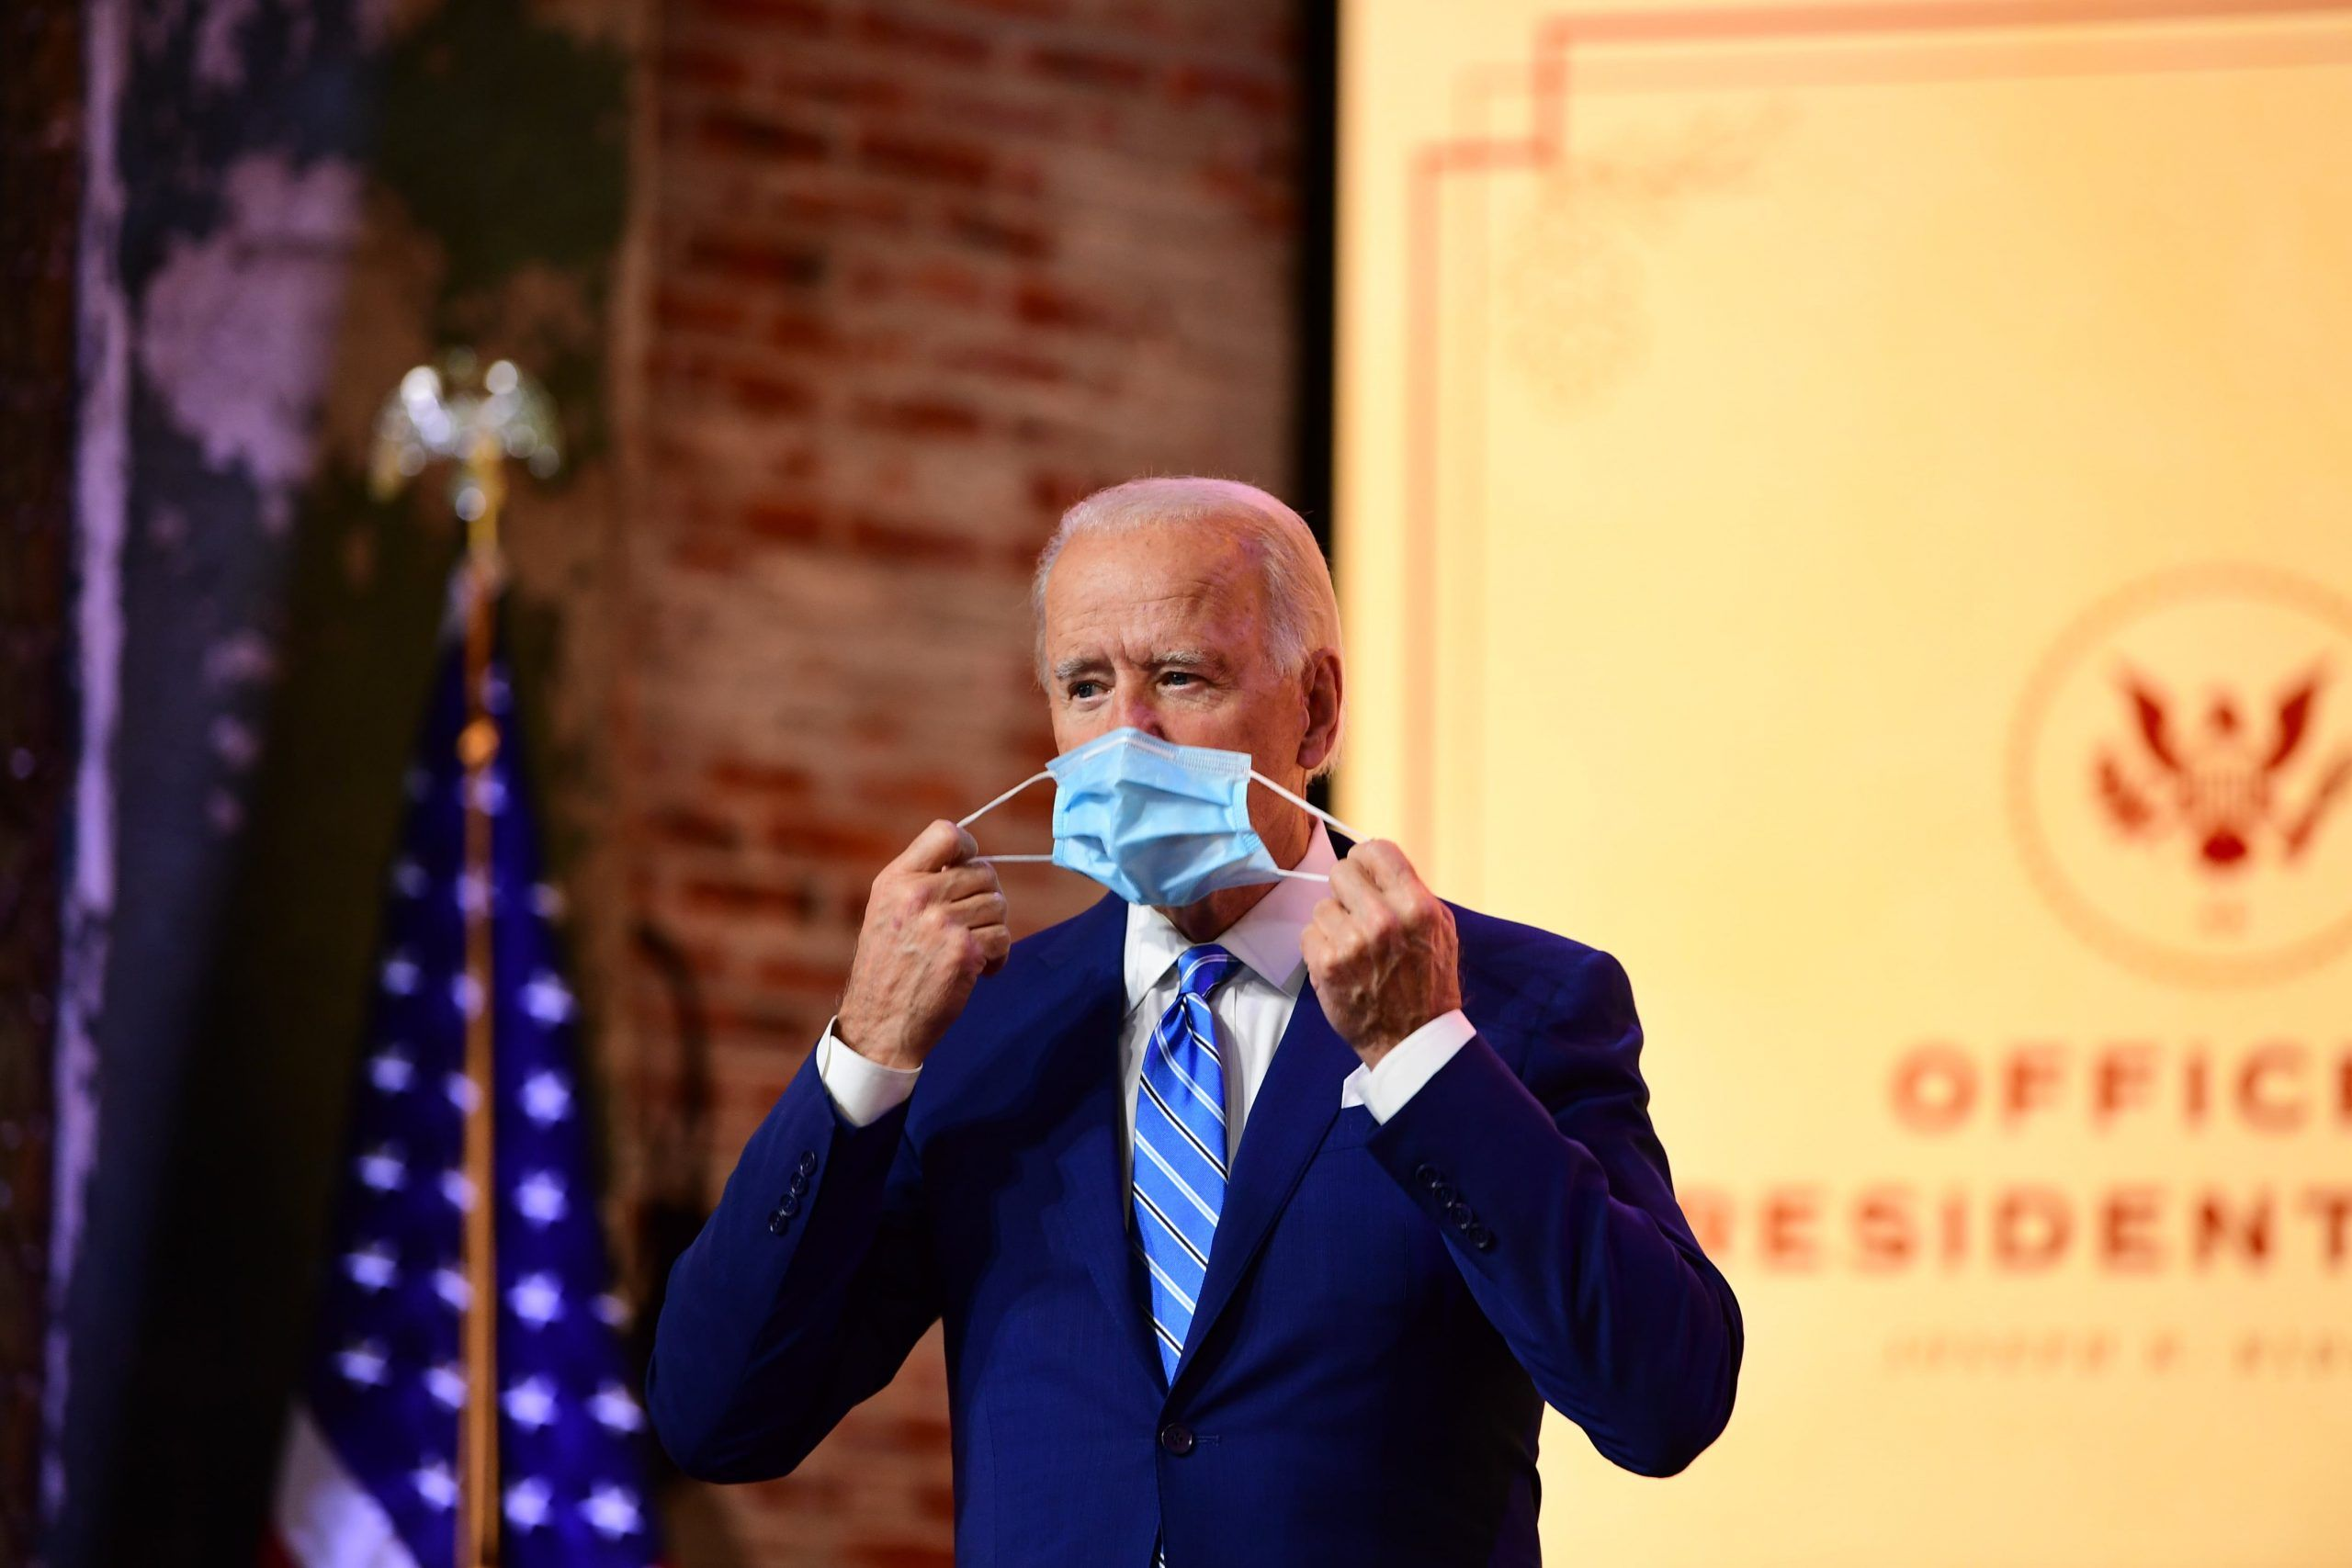 Biden mentre indossa la mascherina